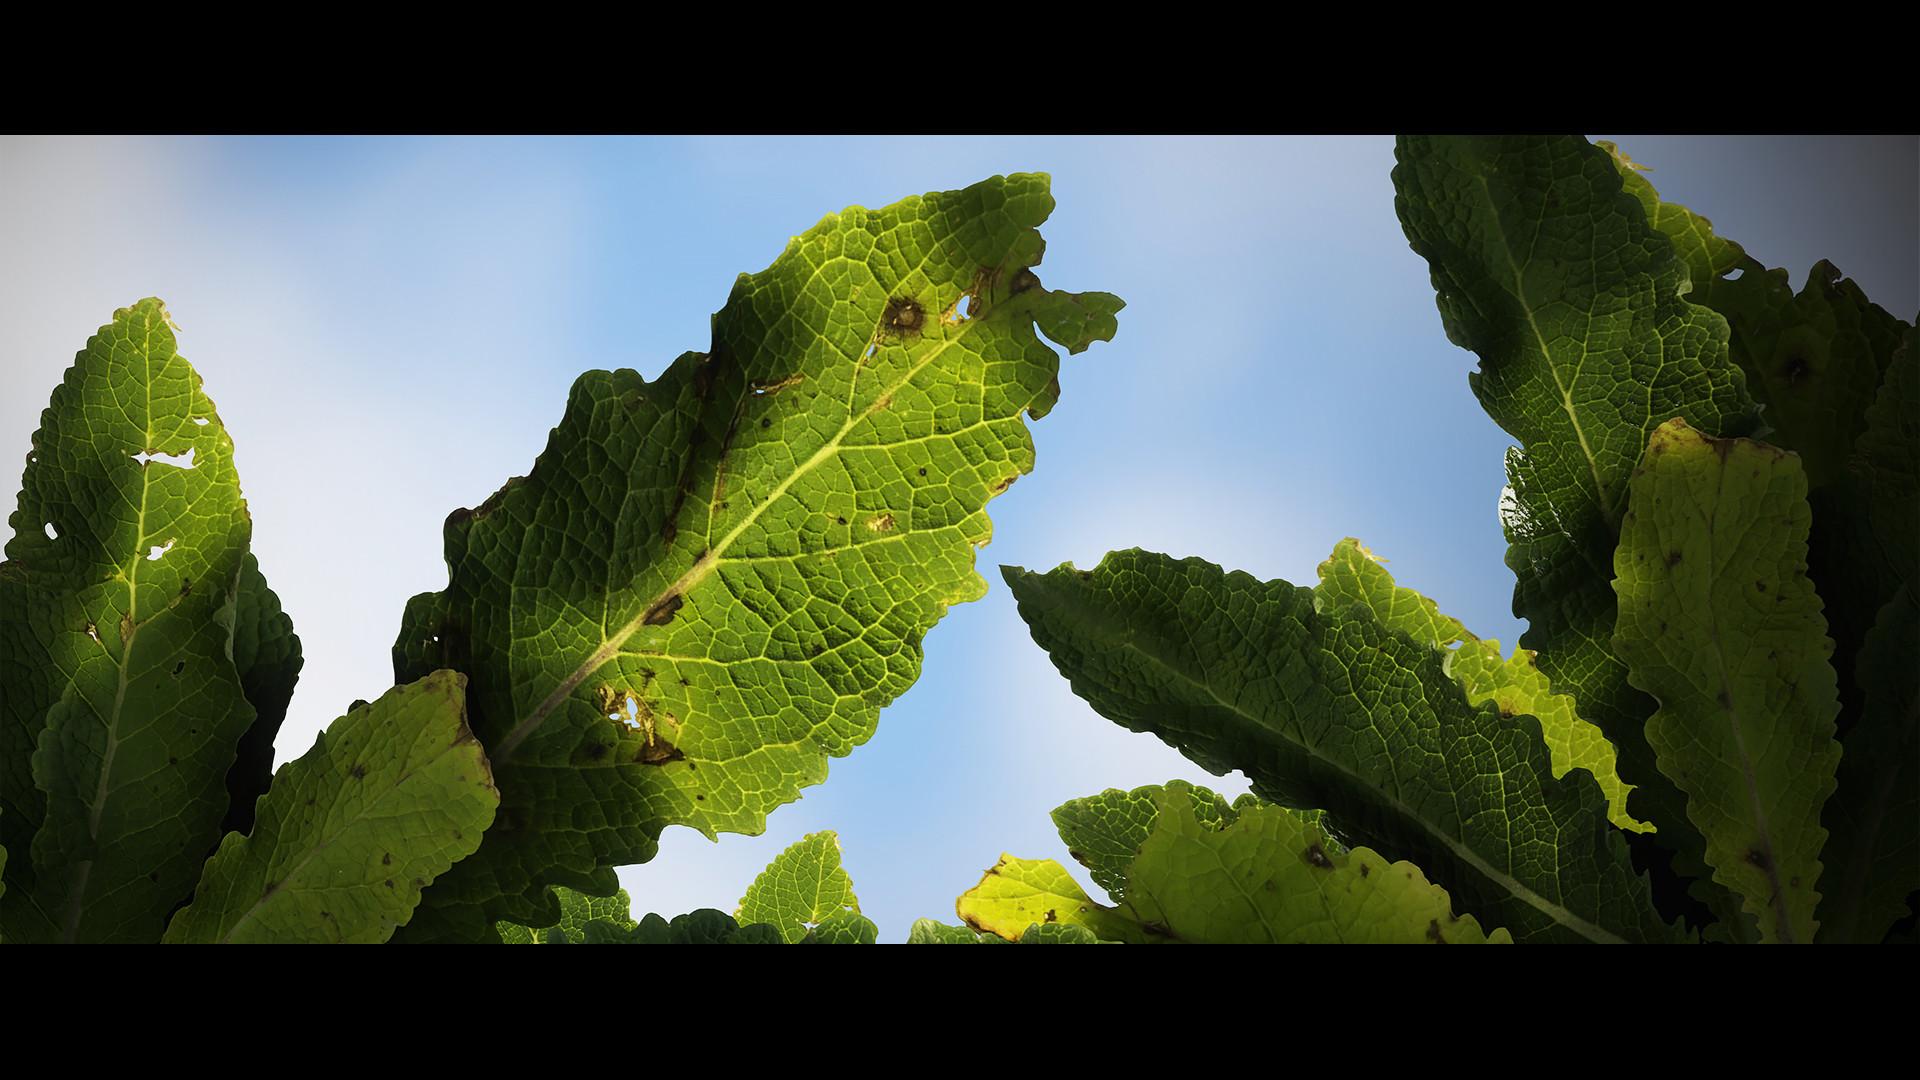 Joe garth plant sky